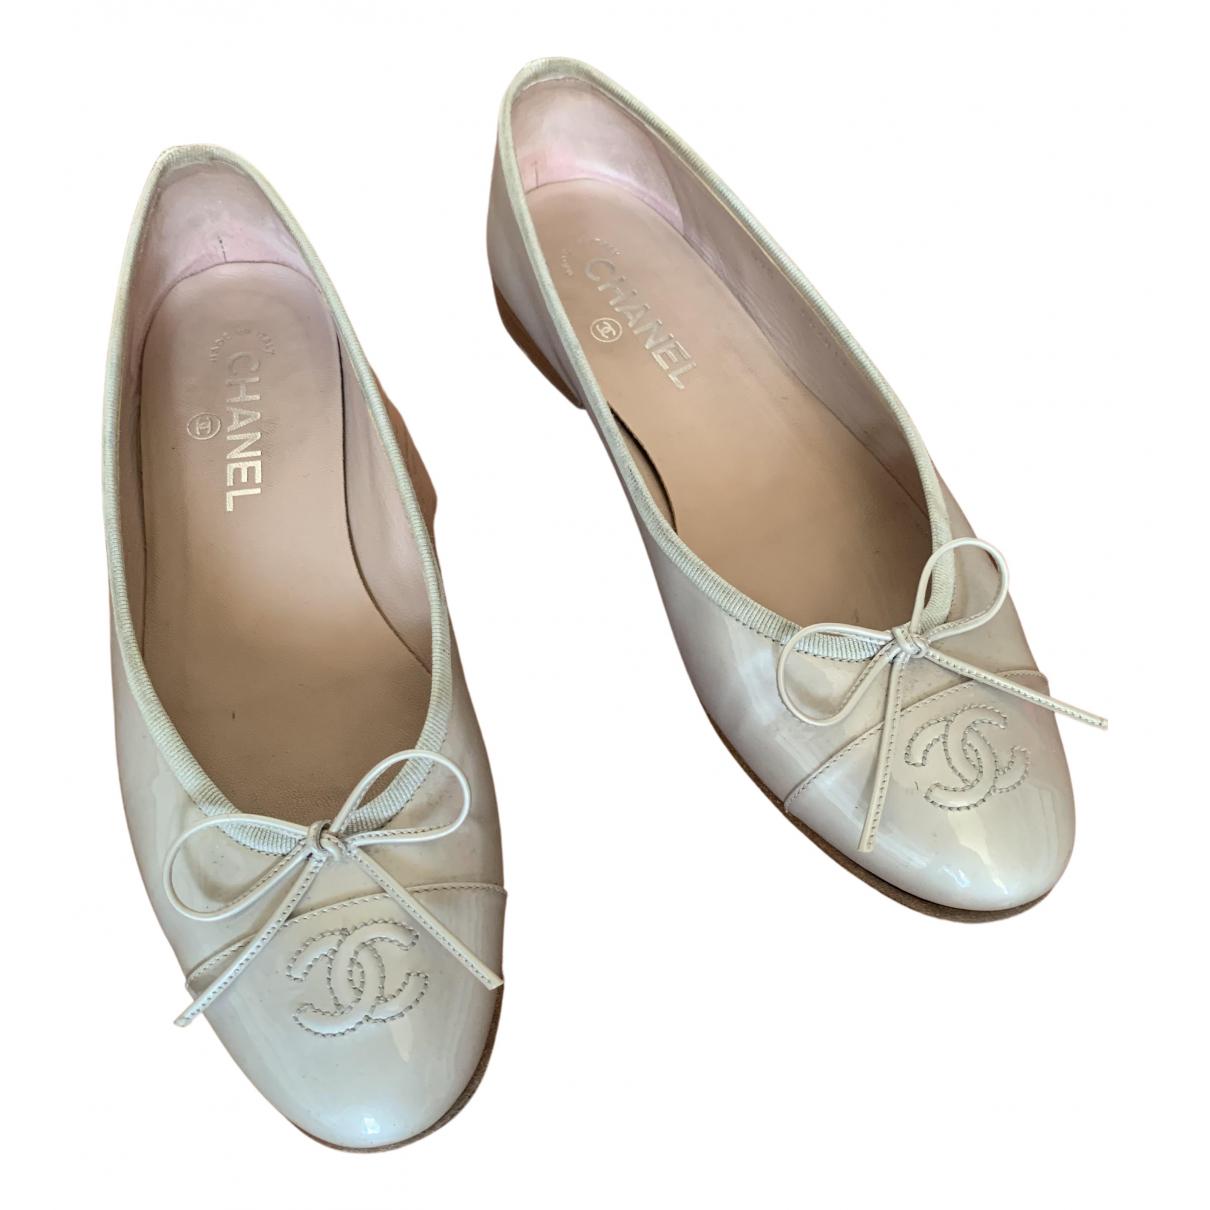 Chanel \N Ballerinas in  Grau Lackleder